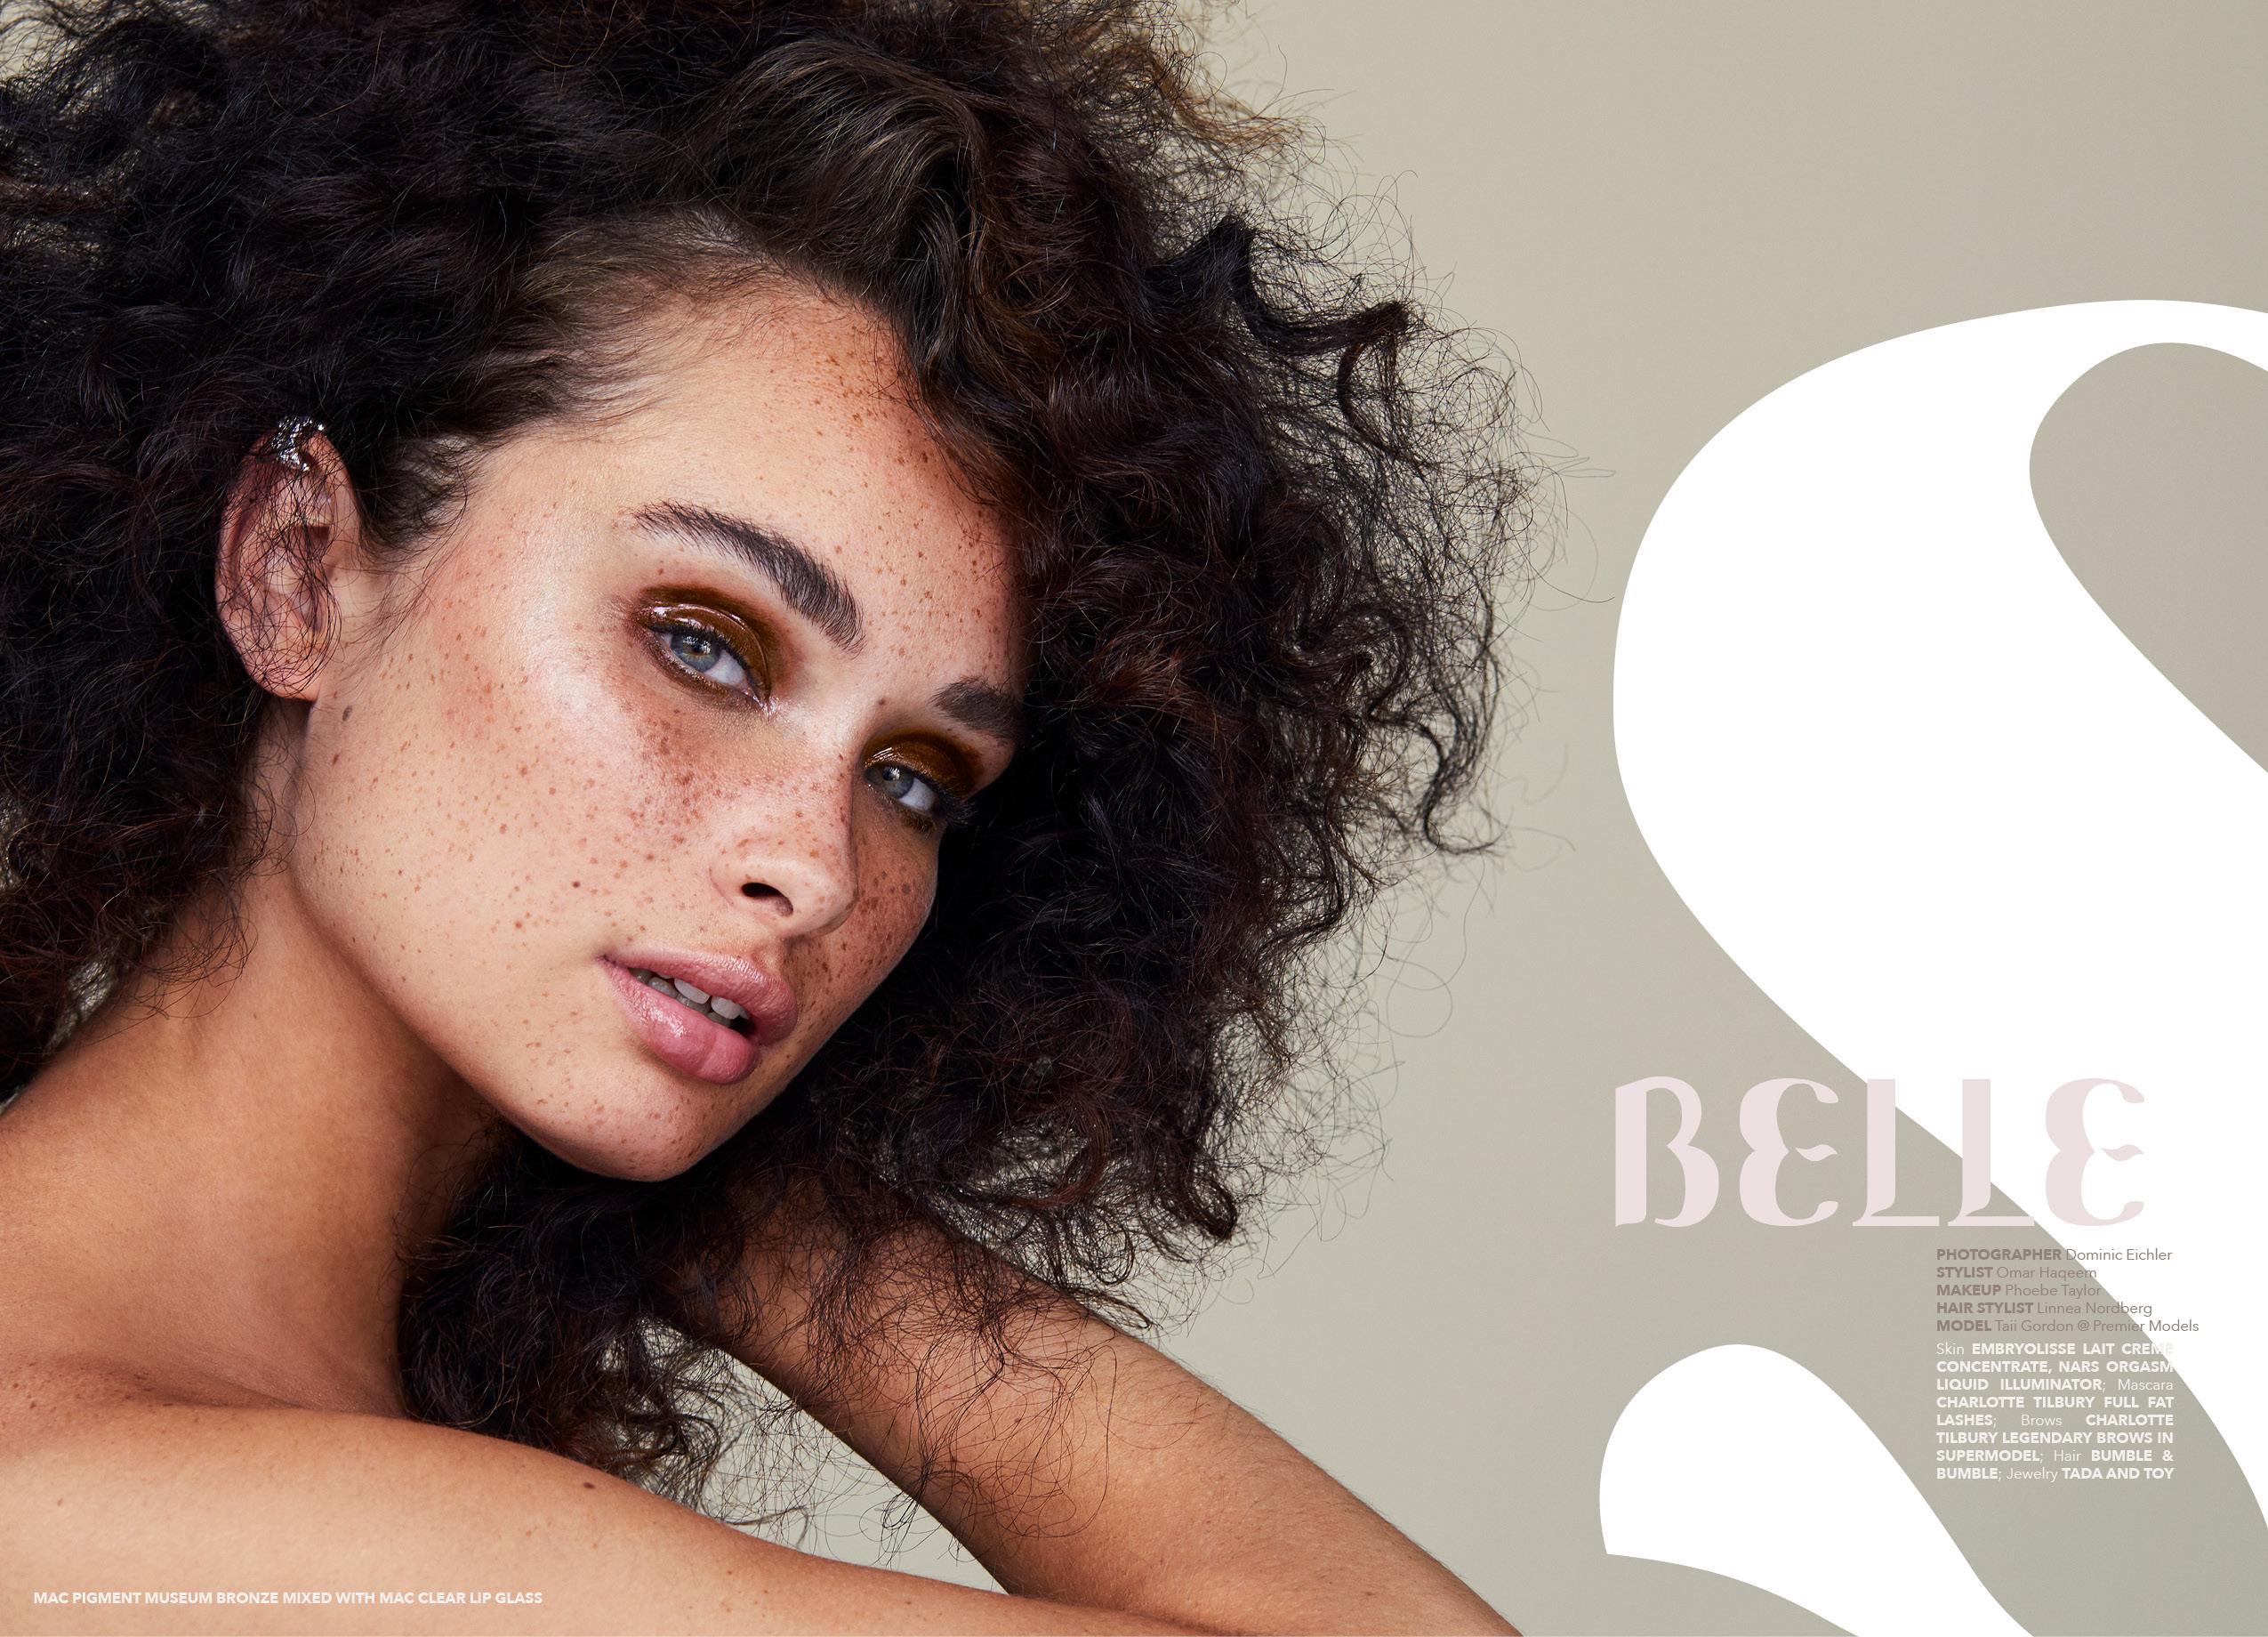 Belle_Atlas_Magazine_Layout_7